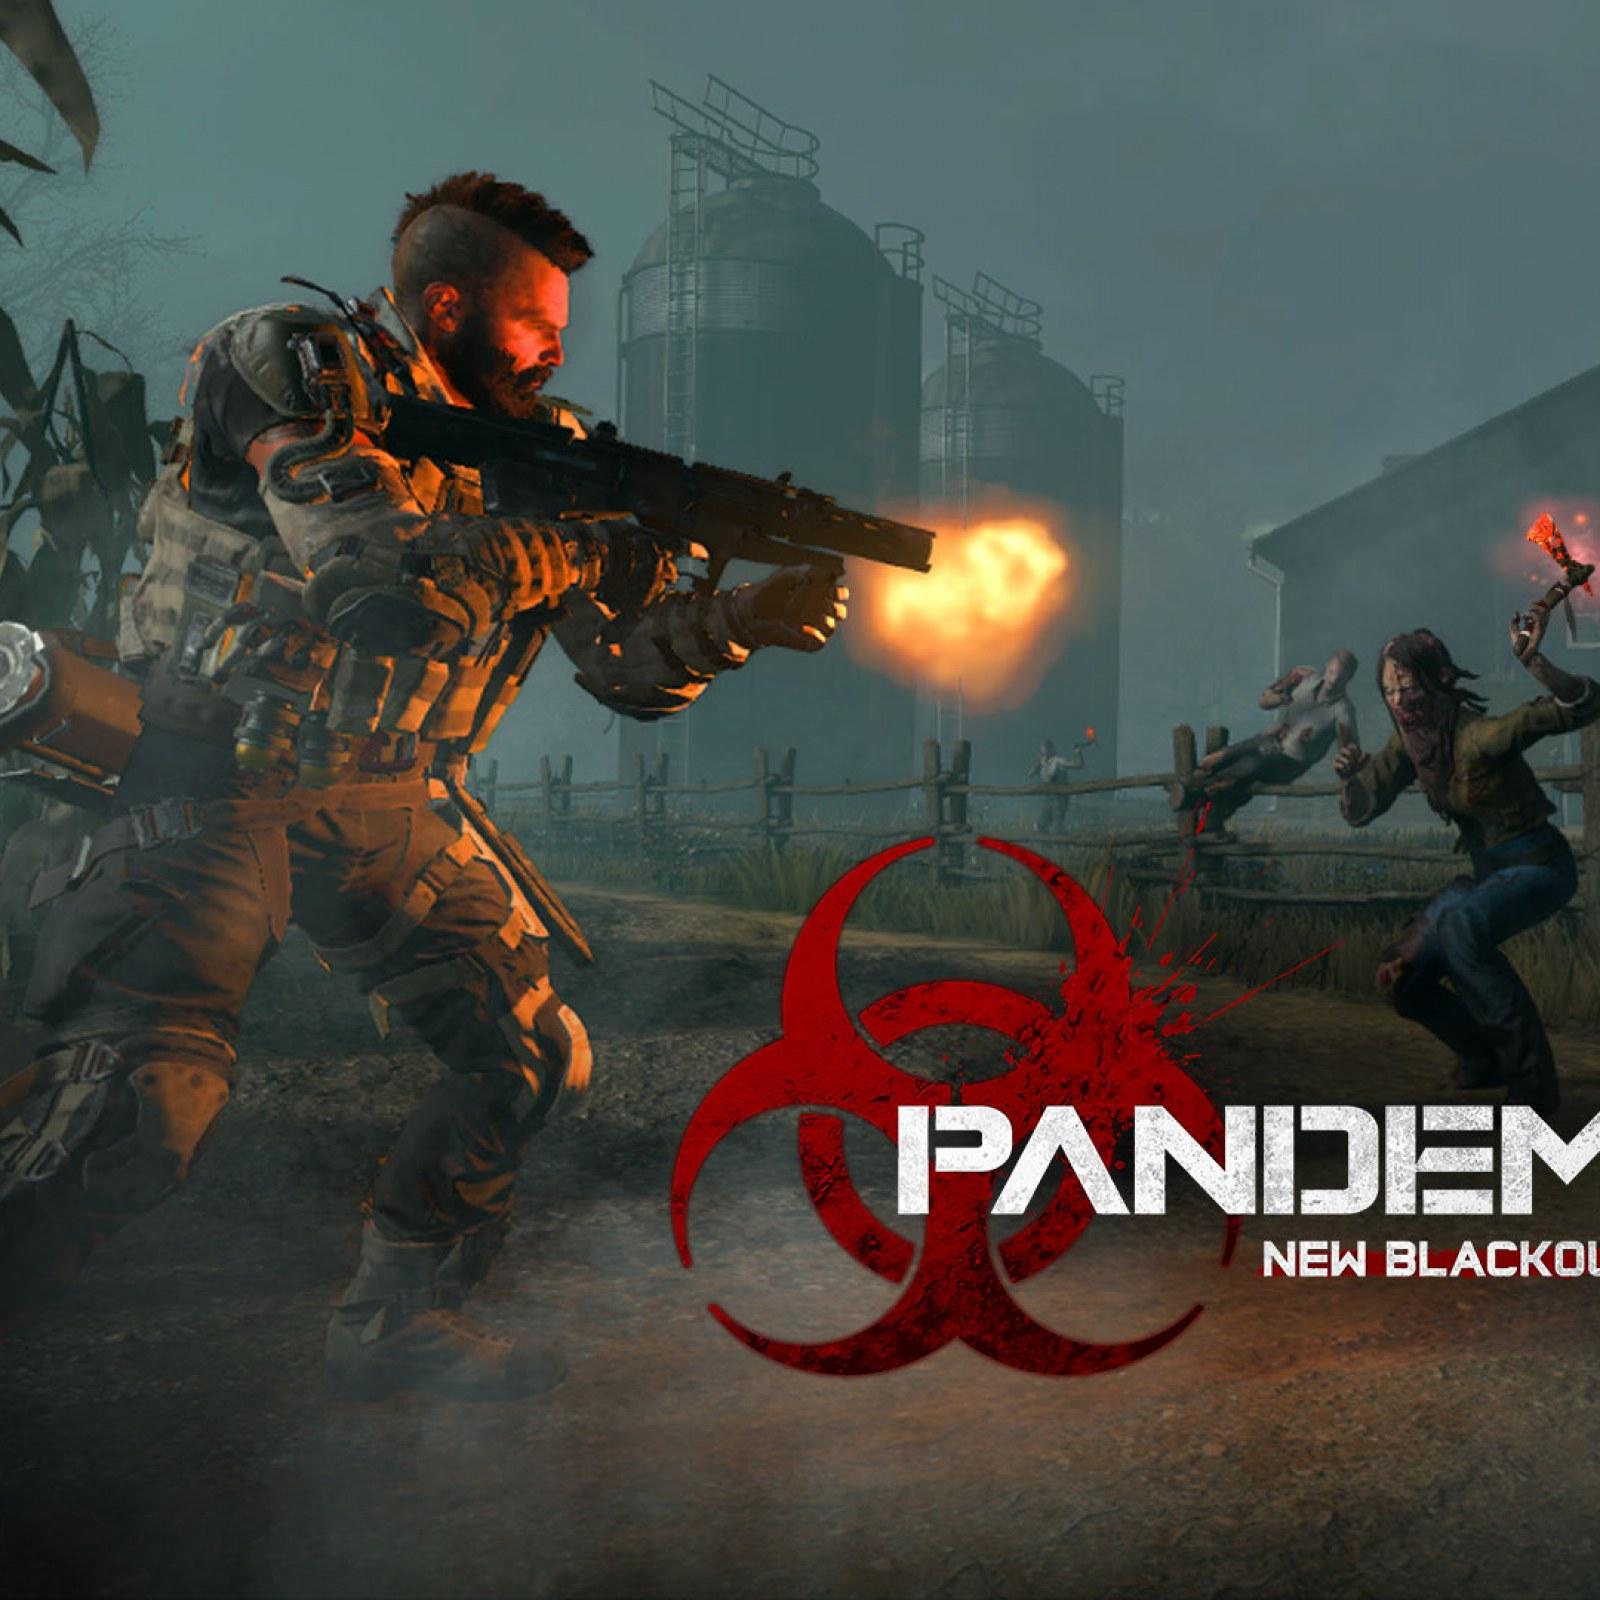 Call of Duty: Black Ops 4' Update 1 23 Fixes Slide